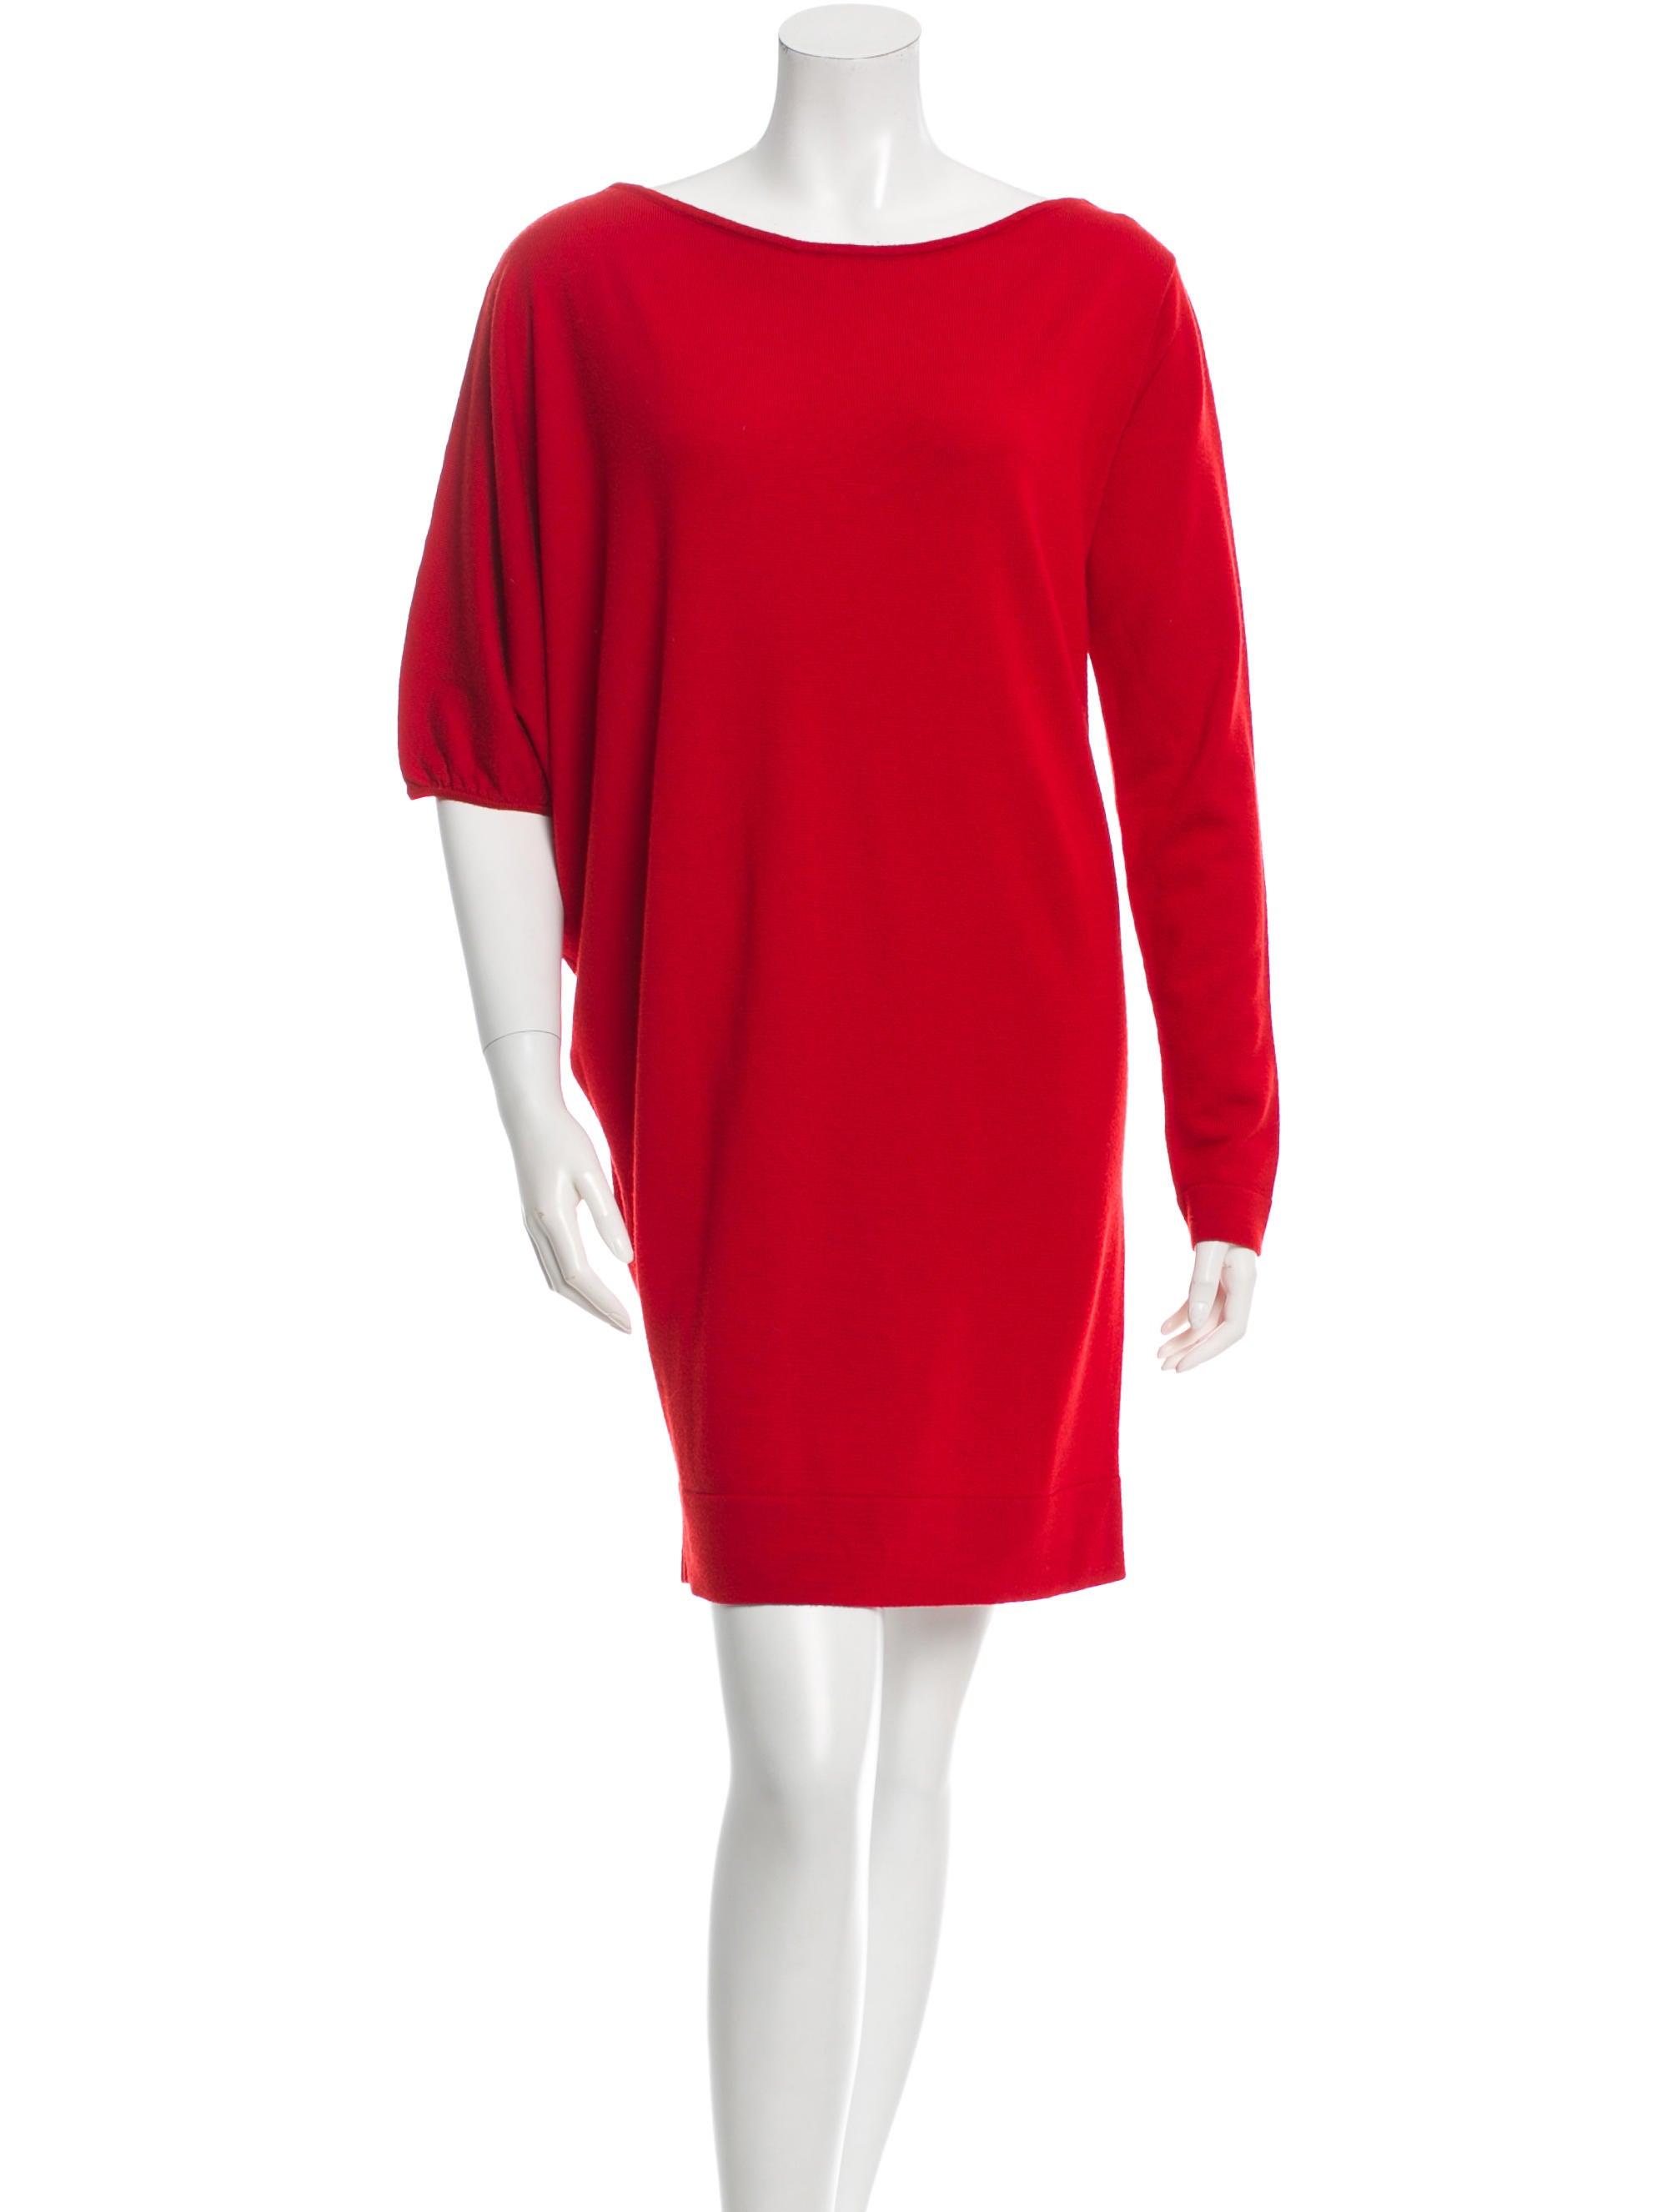 Diane von Furstenberg Wool Sweater Dress - Clothing - WDI56212 | The RealReal